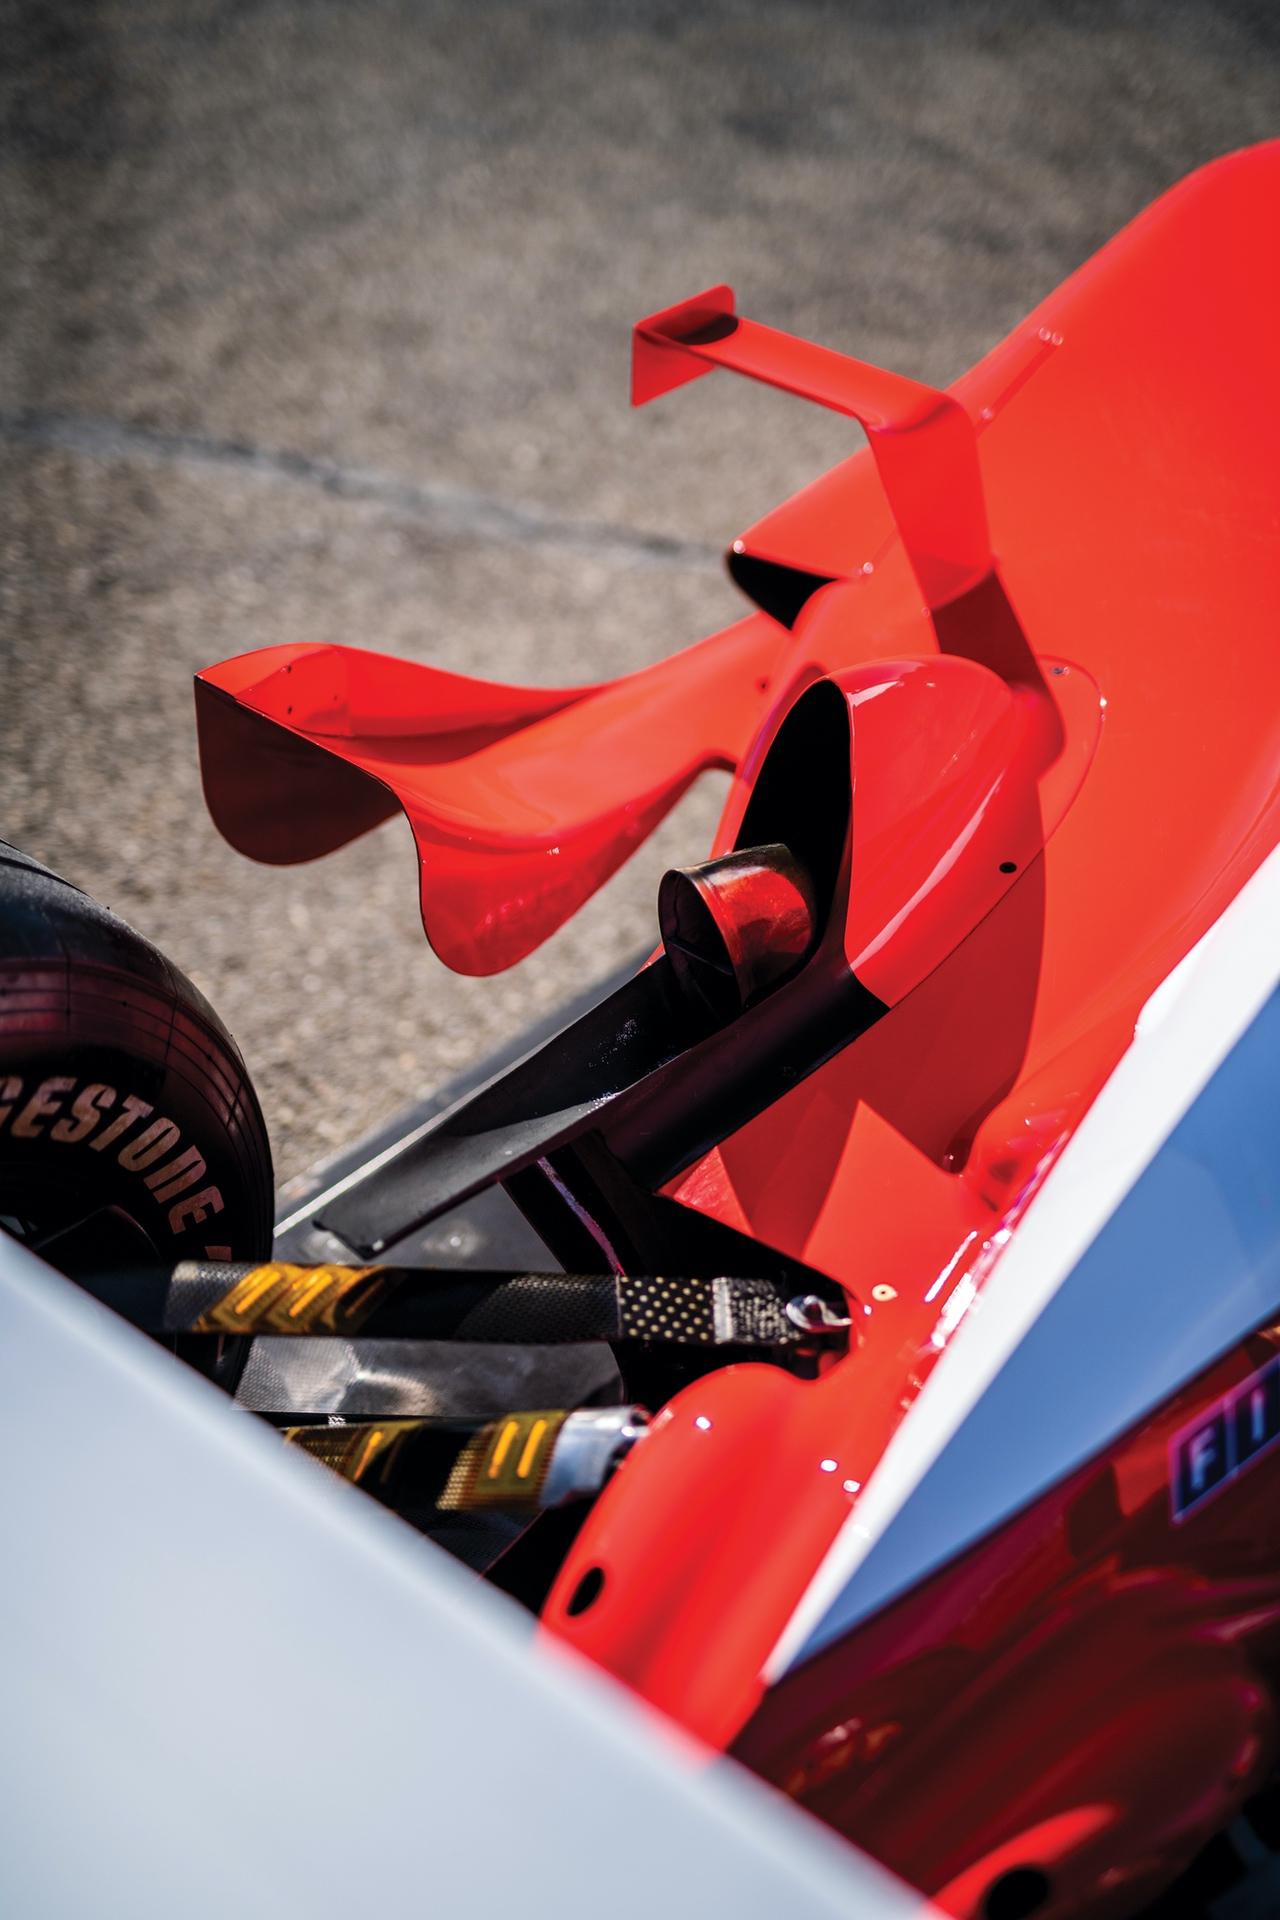 Mick_Schumacher_Ferrari_F2002_0052